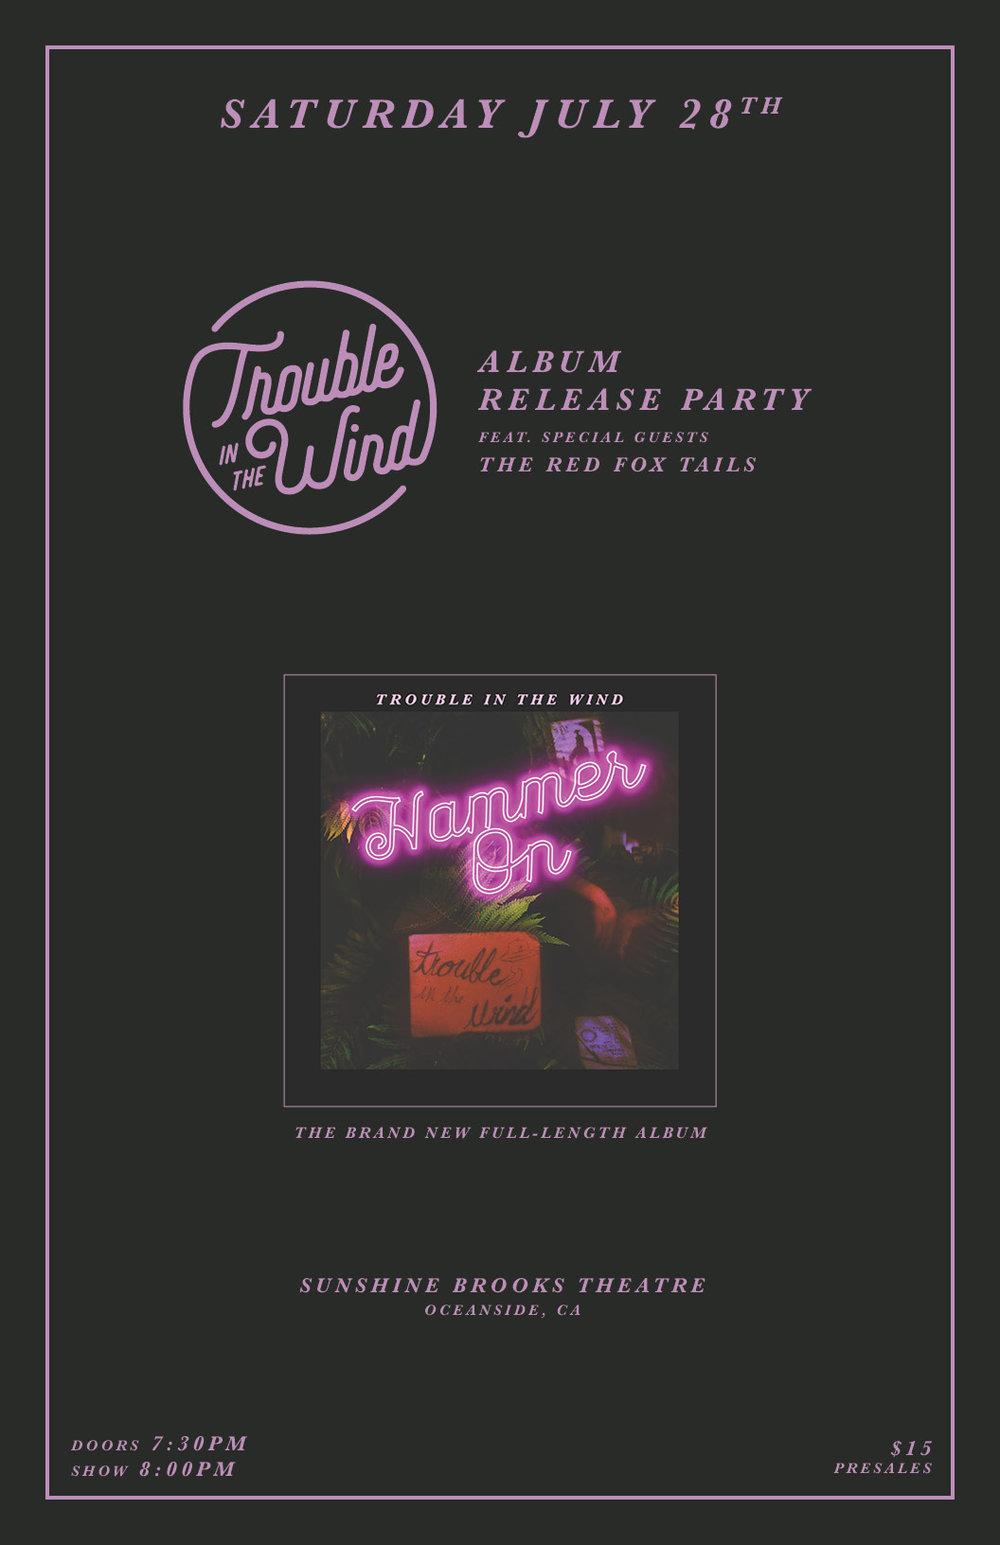 Album Release 11x17 print flyer.jpgJuly 28th